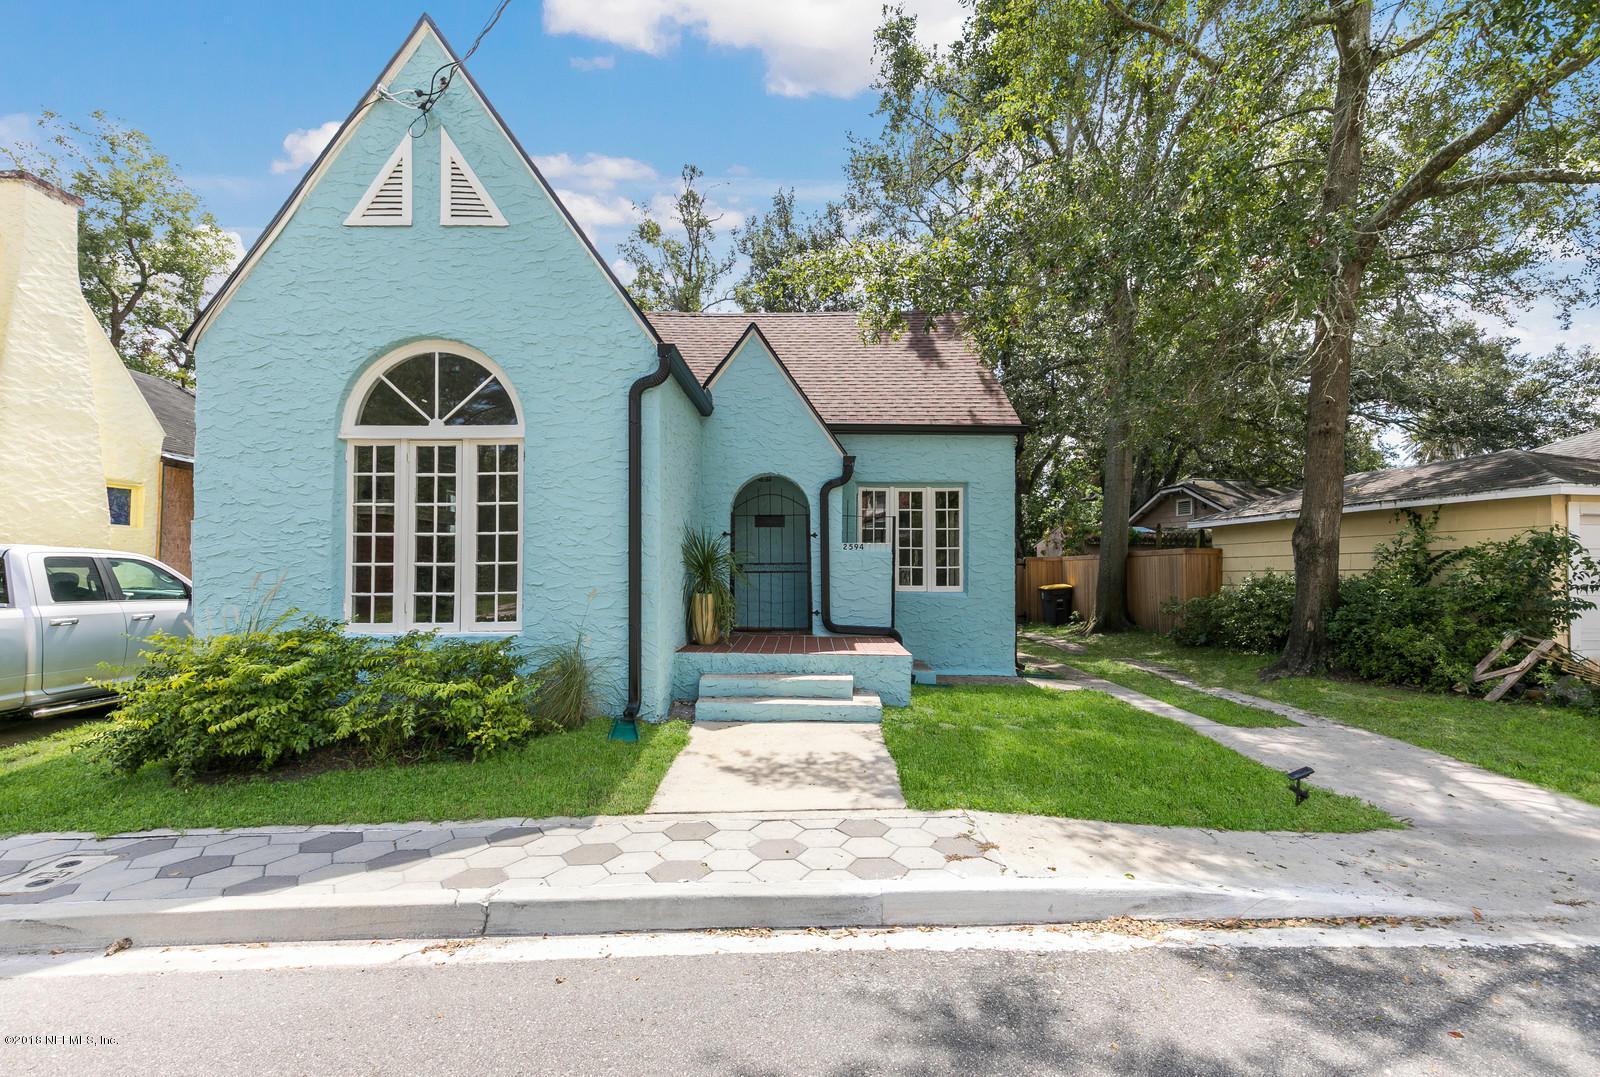 2594 HALDUMAR, JACKSONVILLE, FLORIDA 32204, 2 Bedrooms Bedrooms, ,1 BathroomBathrooms,Residential - single family,For sale,HALDUMAR,958214